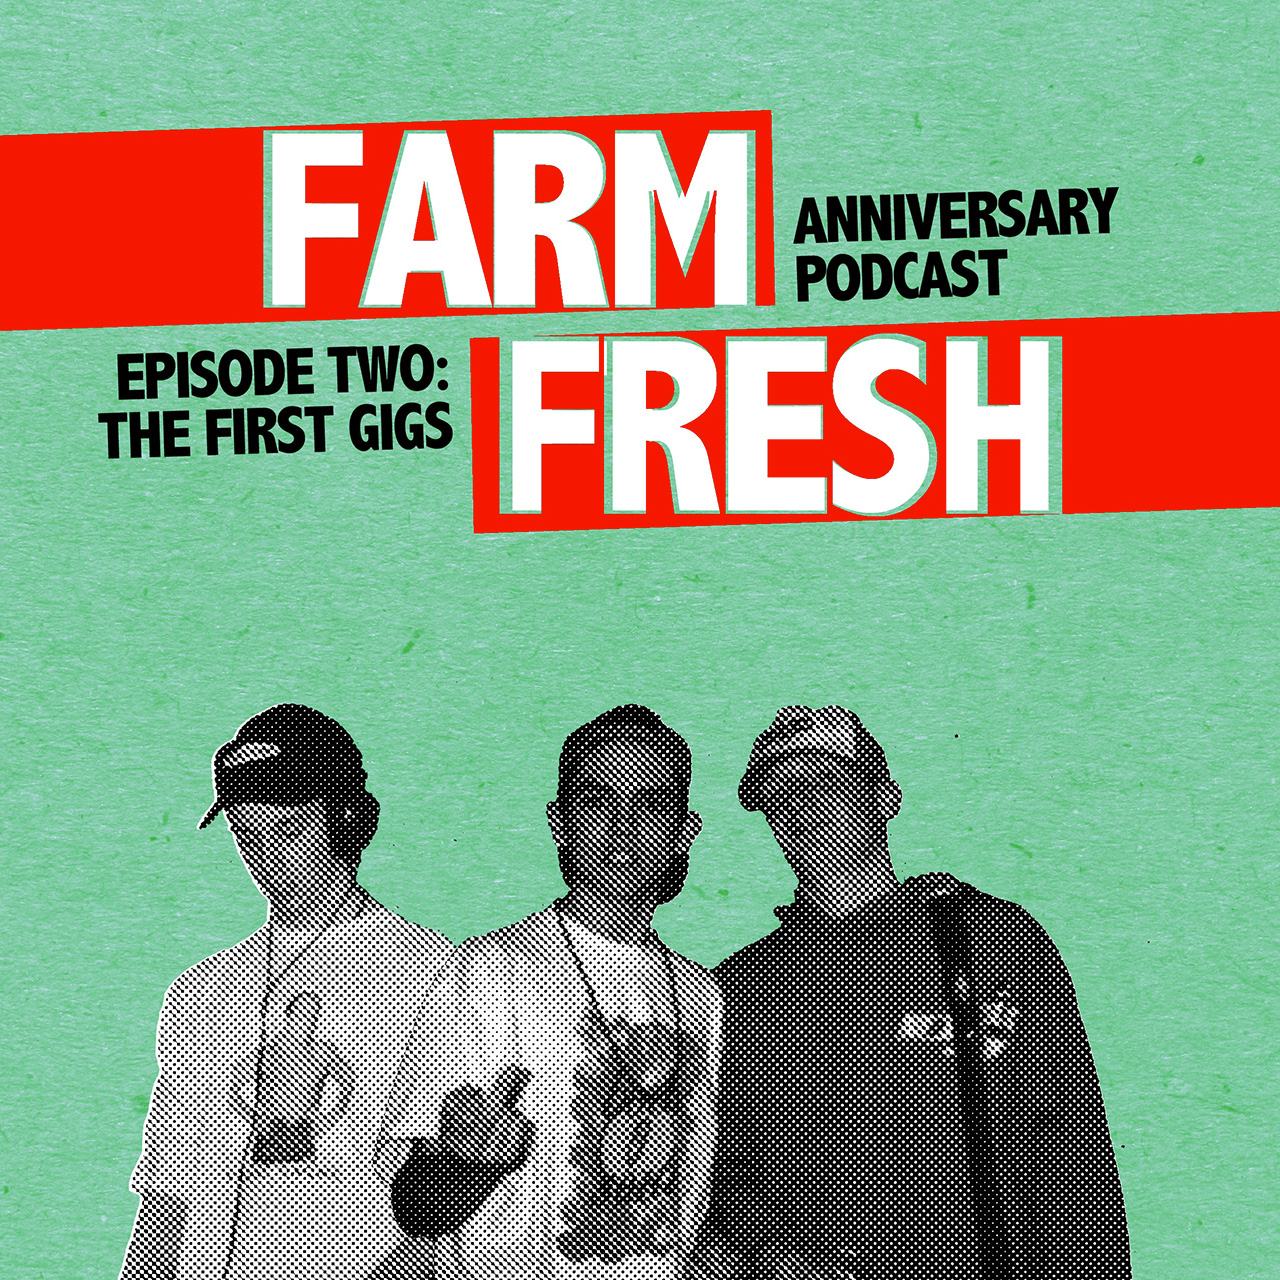 Peanuts & Corn – Farm Fresh 25th Anniversary Podcast Ep. 2